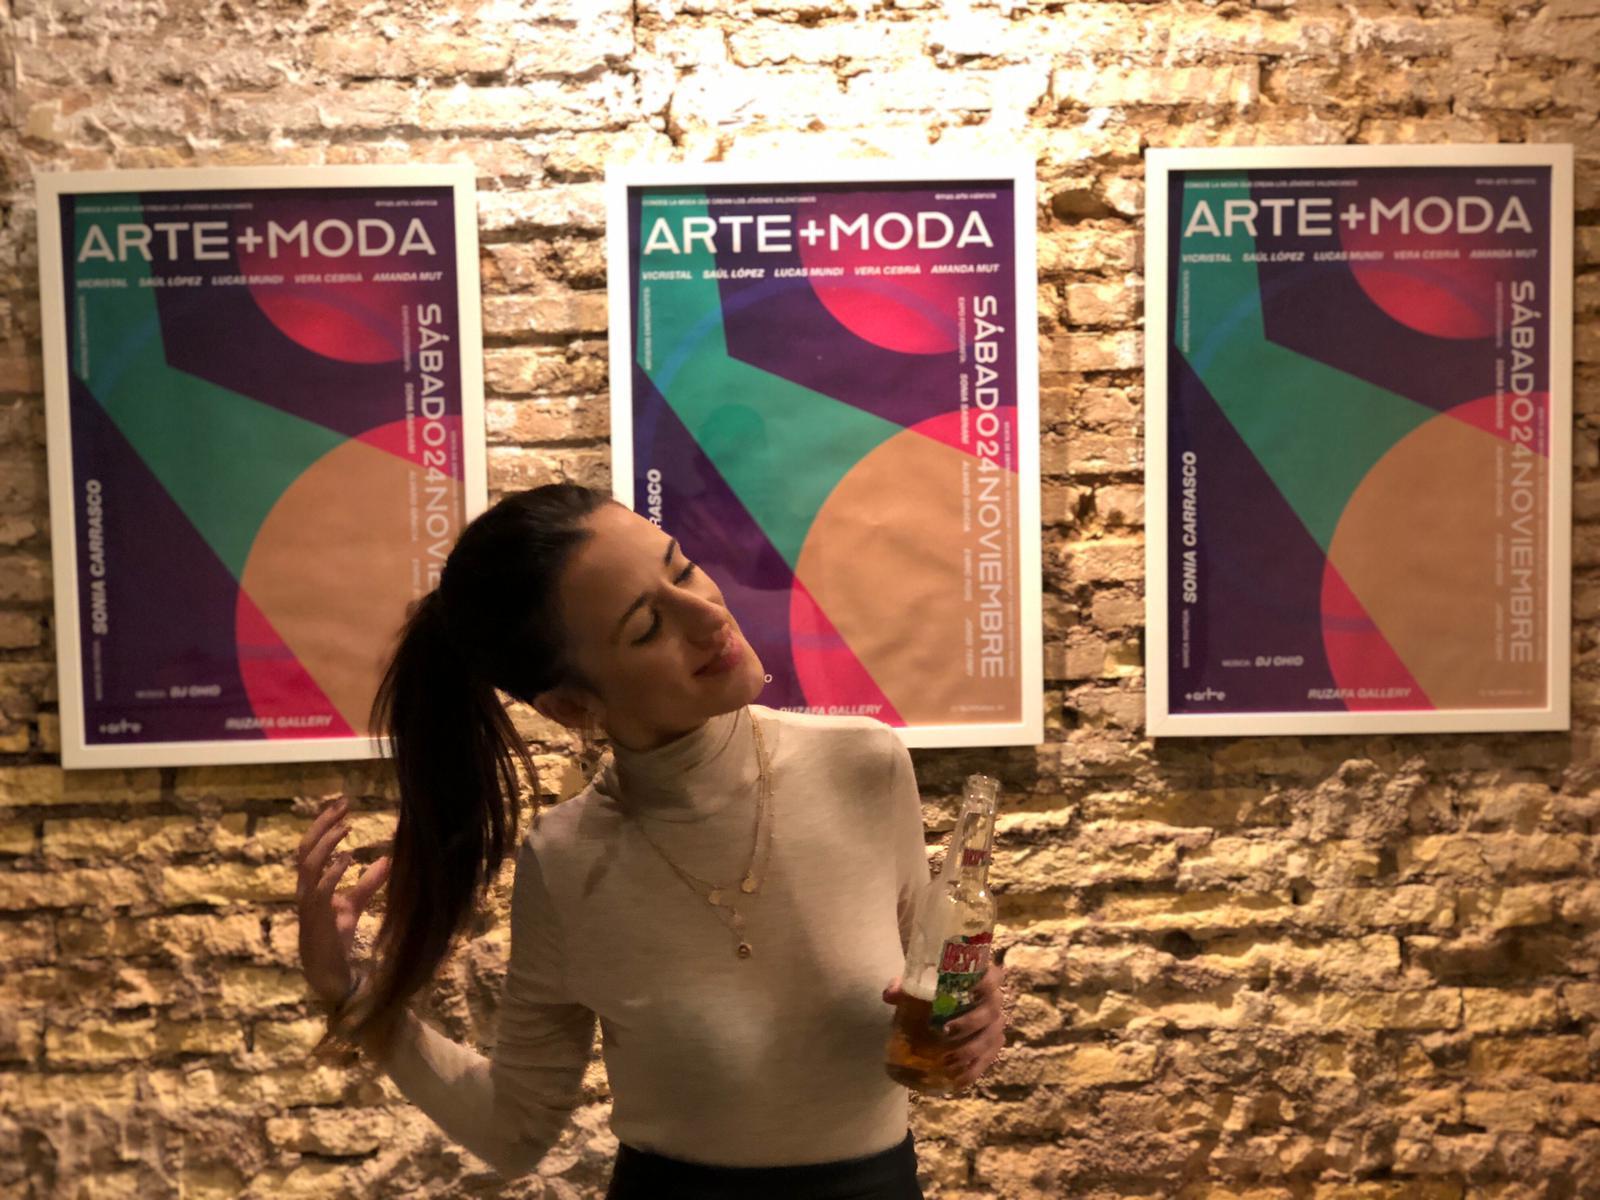 IMG 20181125 WA0059 - Evento: Arte + Moda Valencia